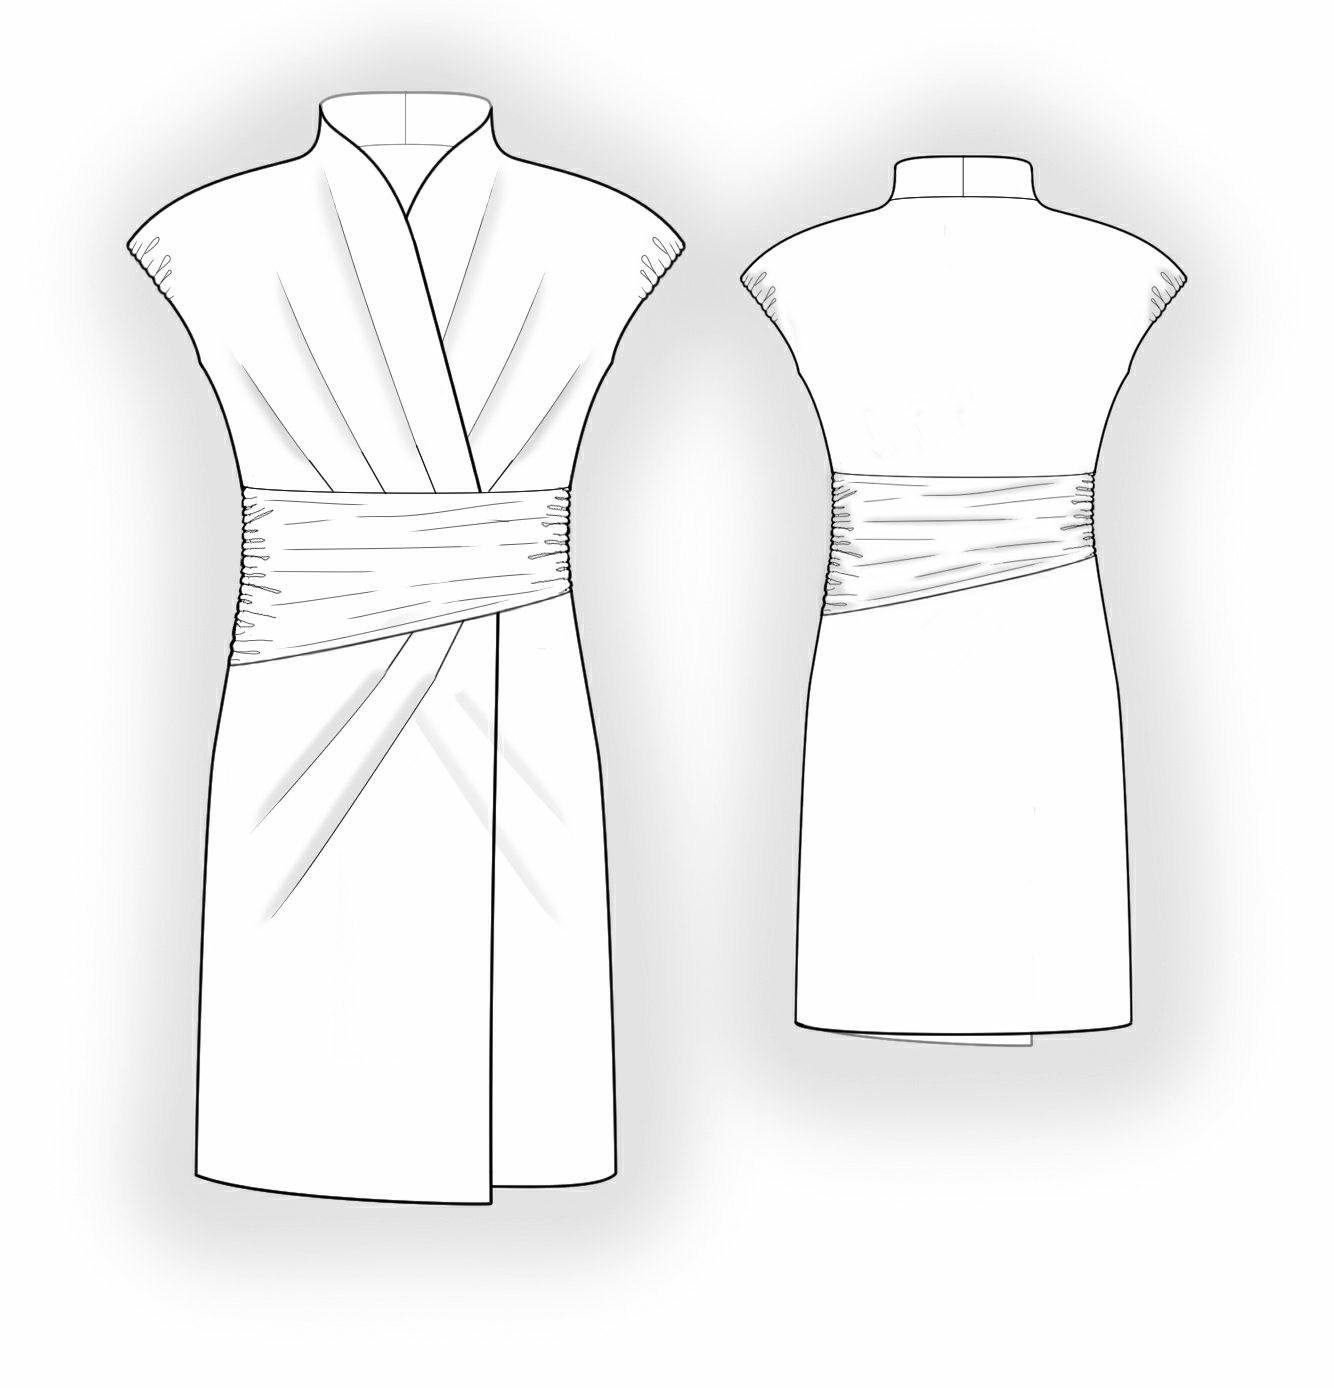 Knit Fabric Dress Pattern : Dress From Knit Fabric - Sewing Pattern #5854. Made-to-measure sewing pattern...